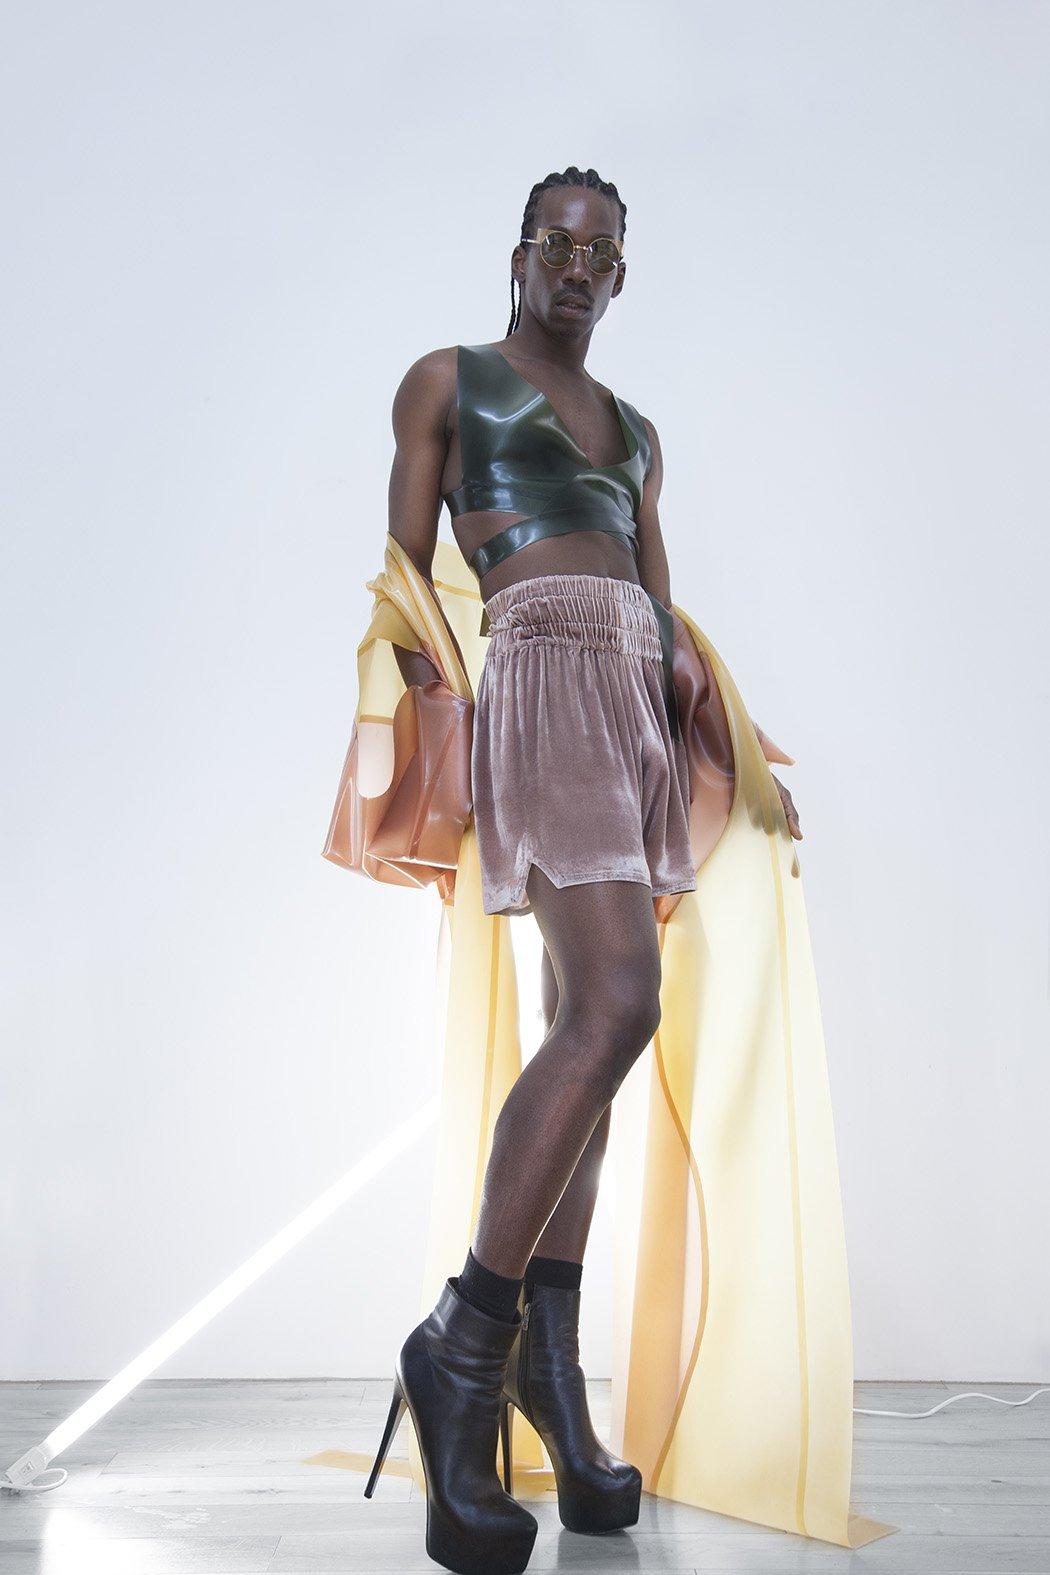 Caribbean-Born Dancer Kyle Patrick is Naturally Glam!